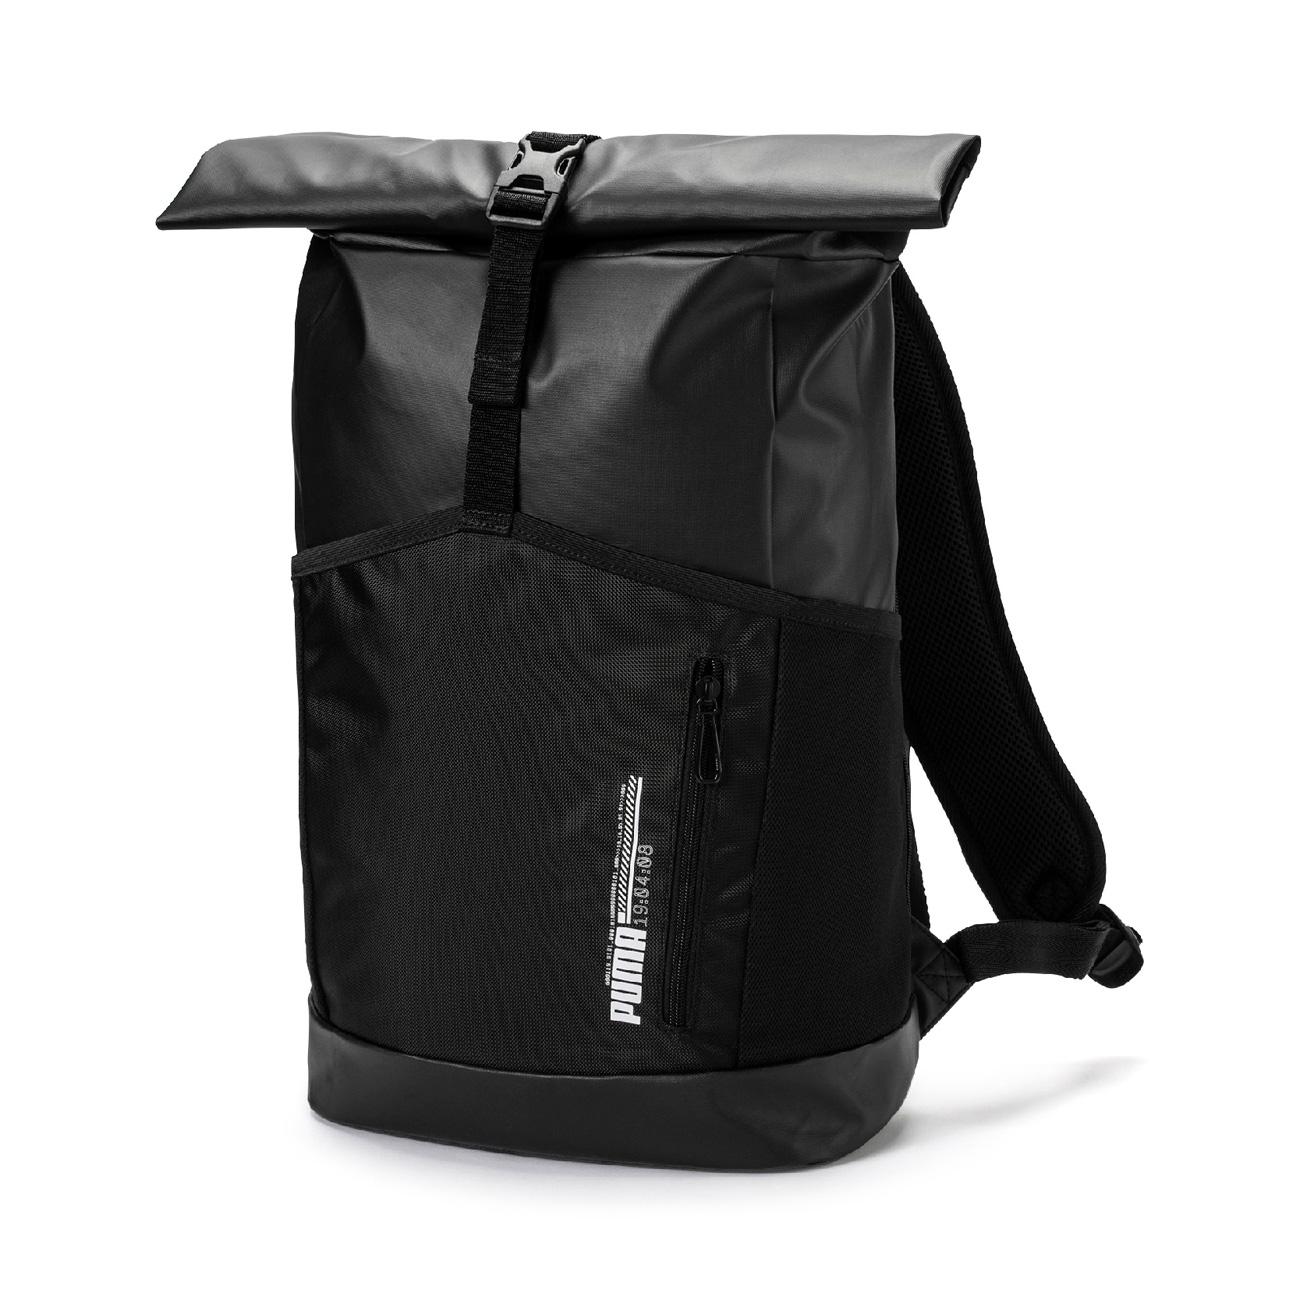 An image of Puma Energy Black Rolltop Backpack - OSFA, PUMA BLACK